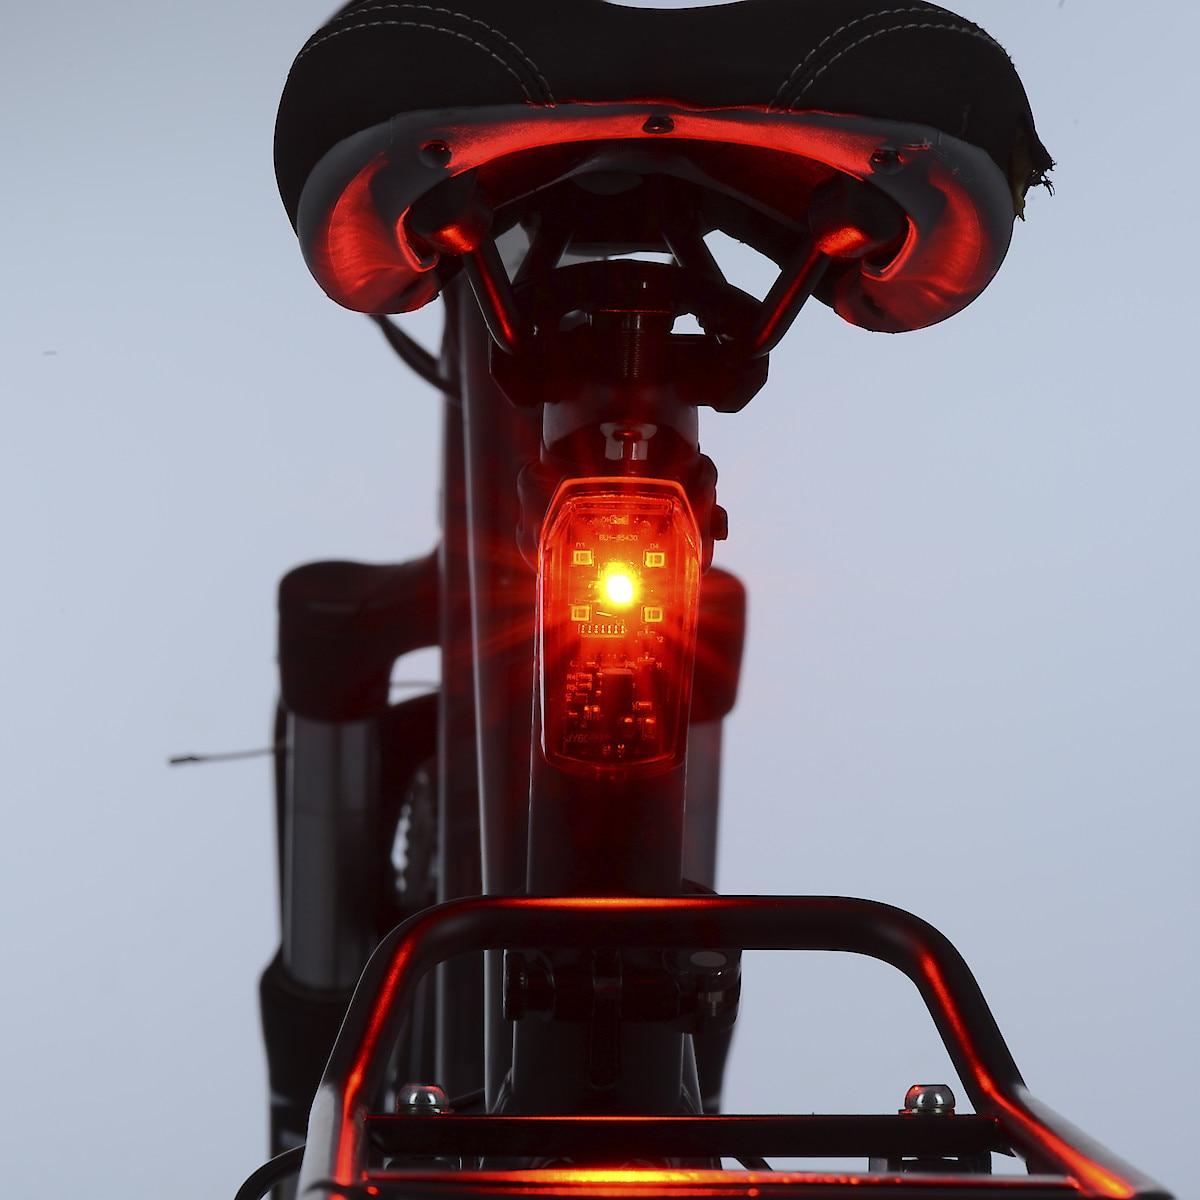 Oxford sykkelbaklys med bremselys